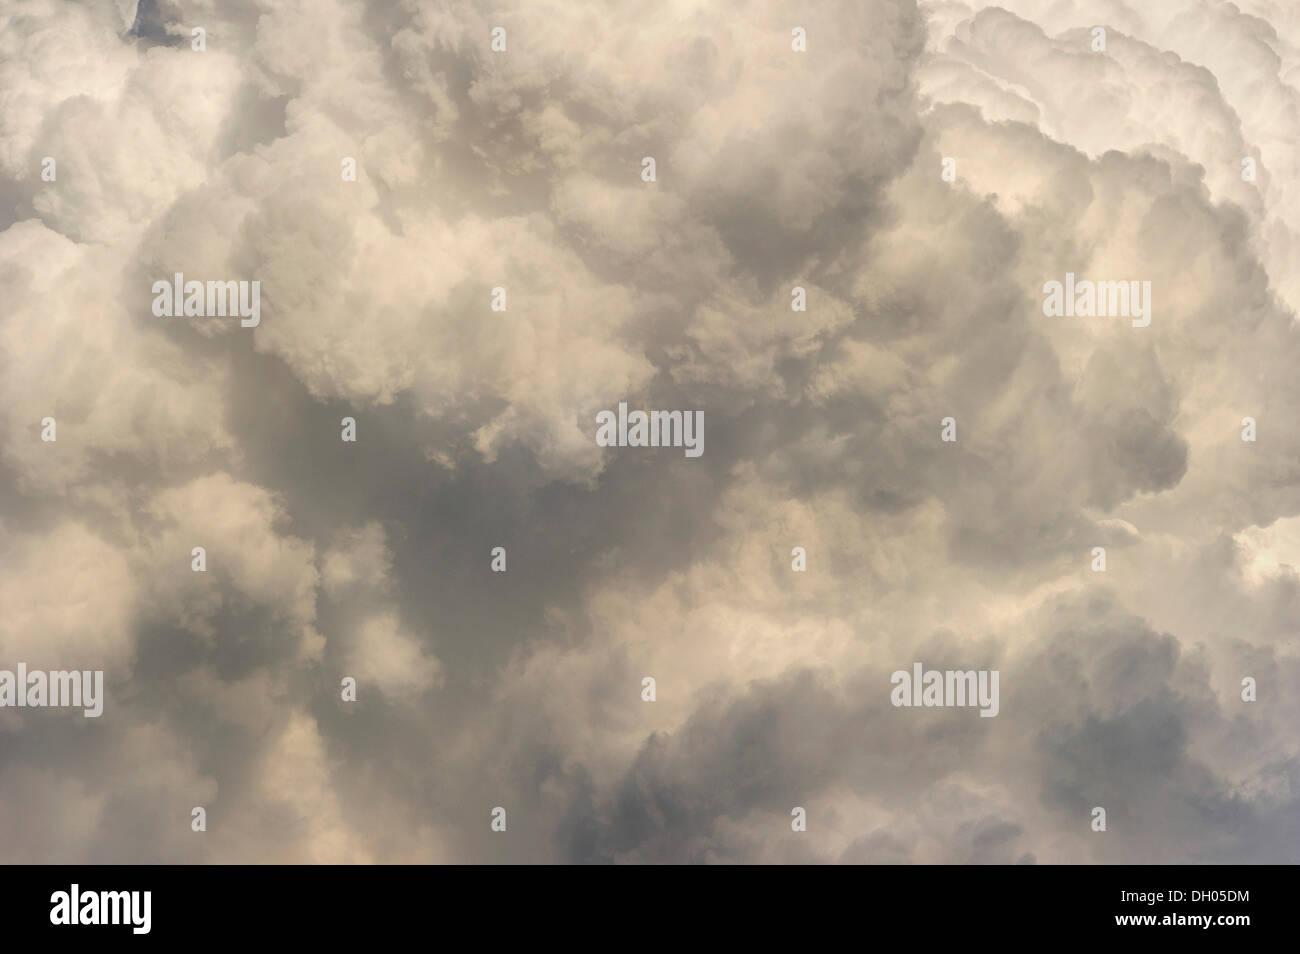 Cumulonimbus cloud, thundercloud, detail, Marzling, Upper Bavaria, Bavaria, Germany - Stock Image